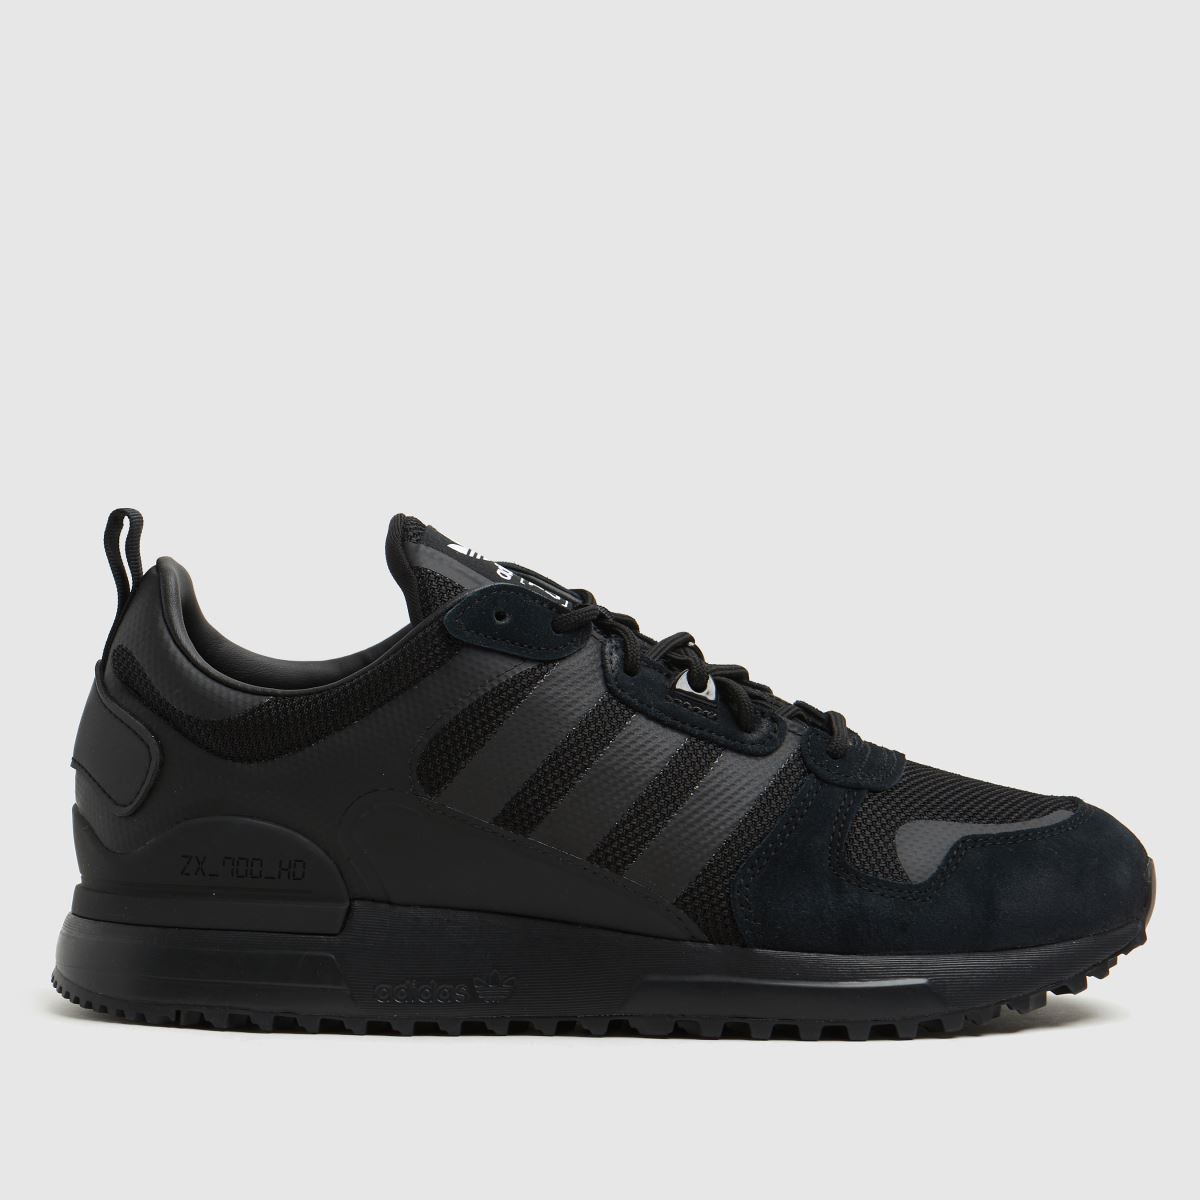 Adidas Black Zx 700 Hd Trainers